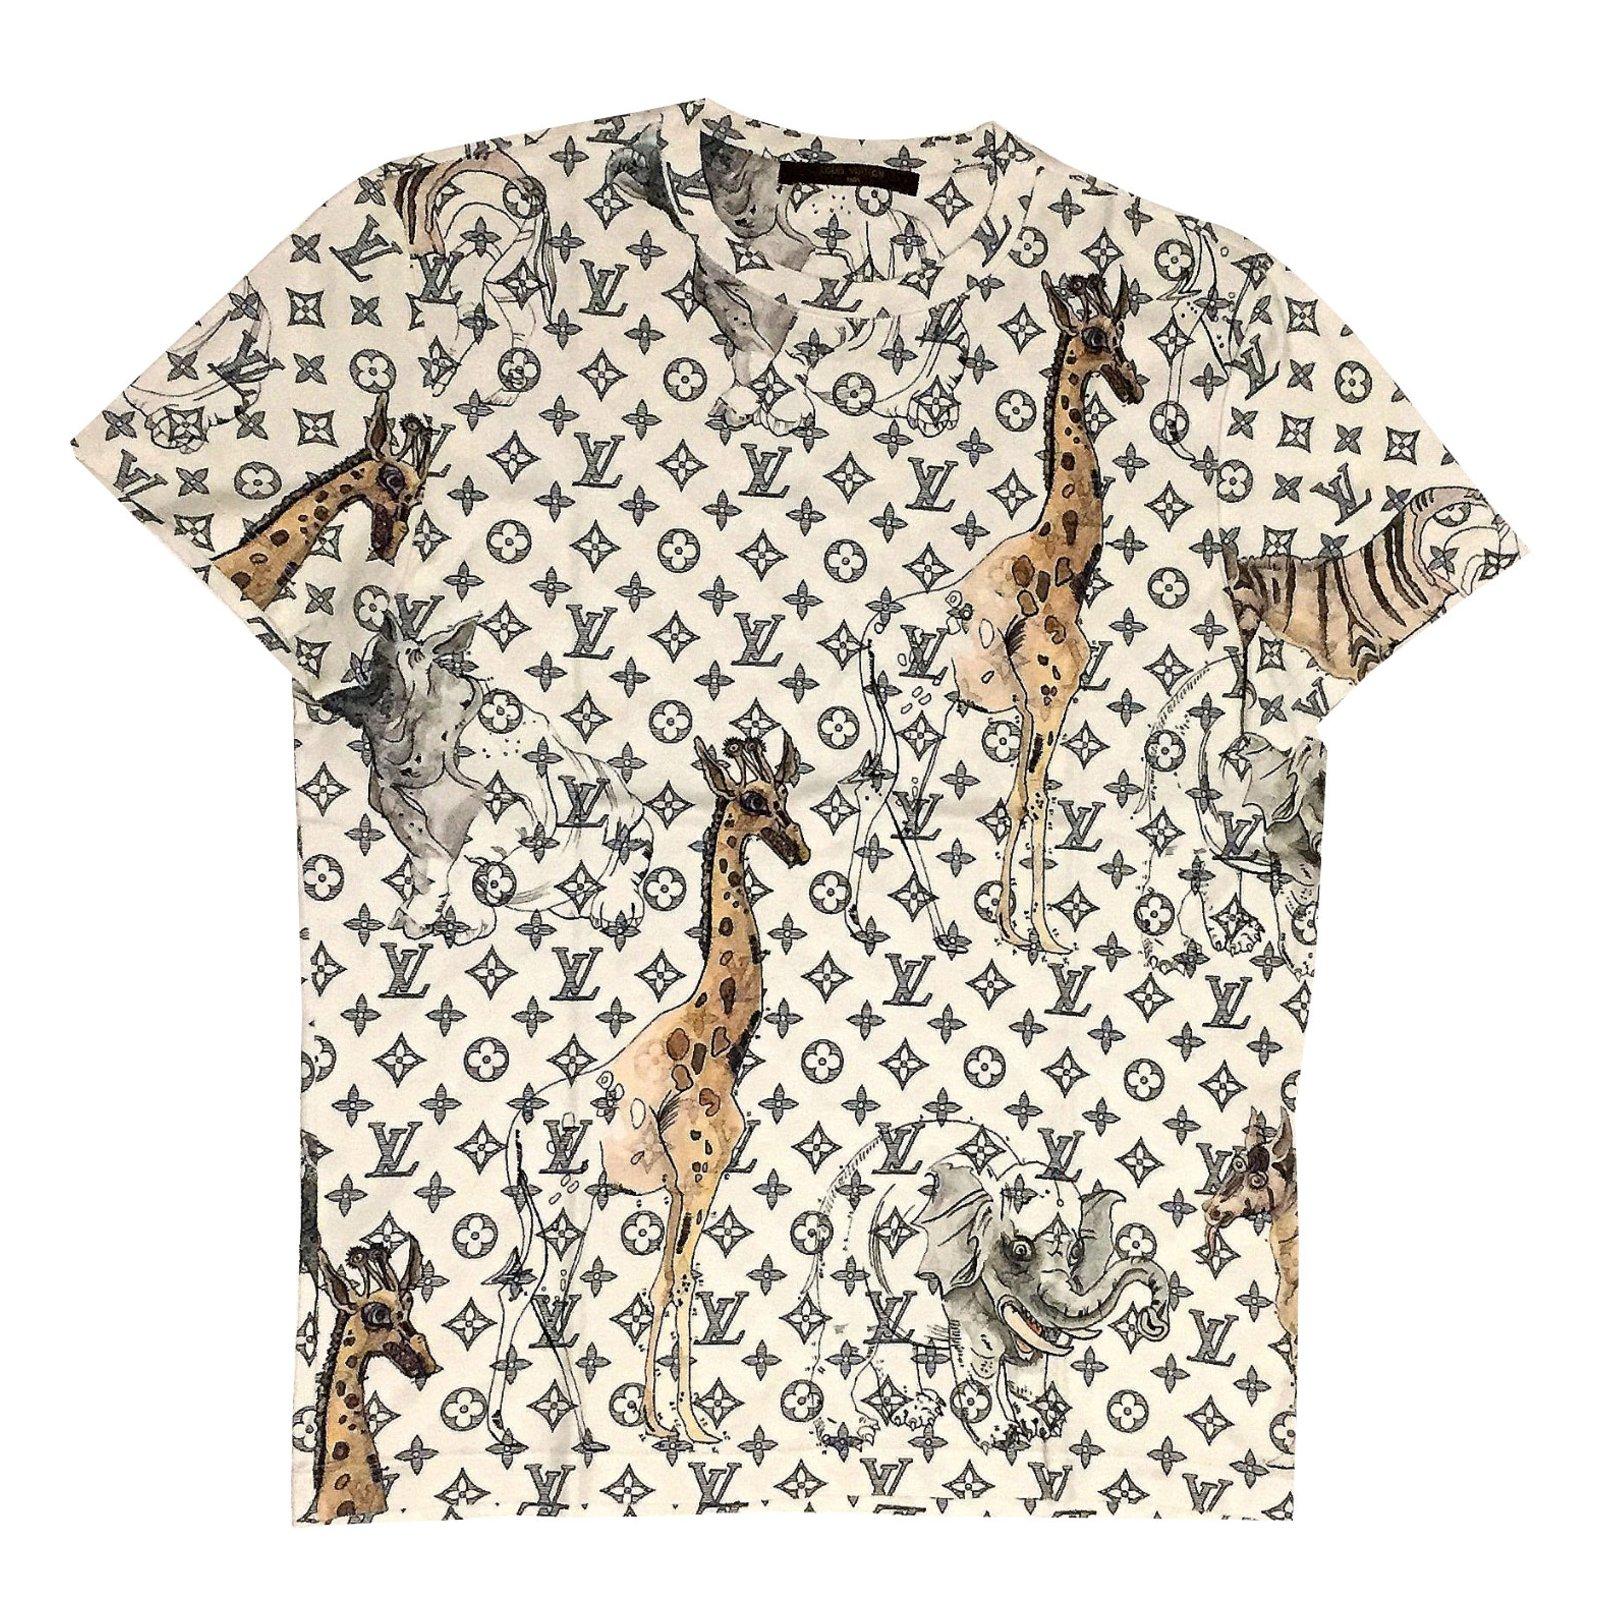 bdfd9dc52dc0 Louis Vuitton Safari Tees Cotton Eggshell ref.84609 - Joli Closet